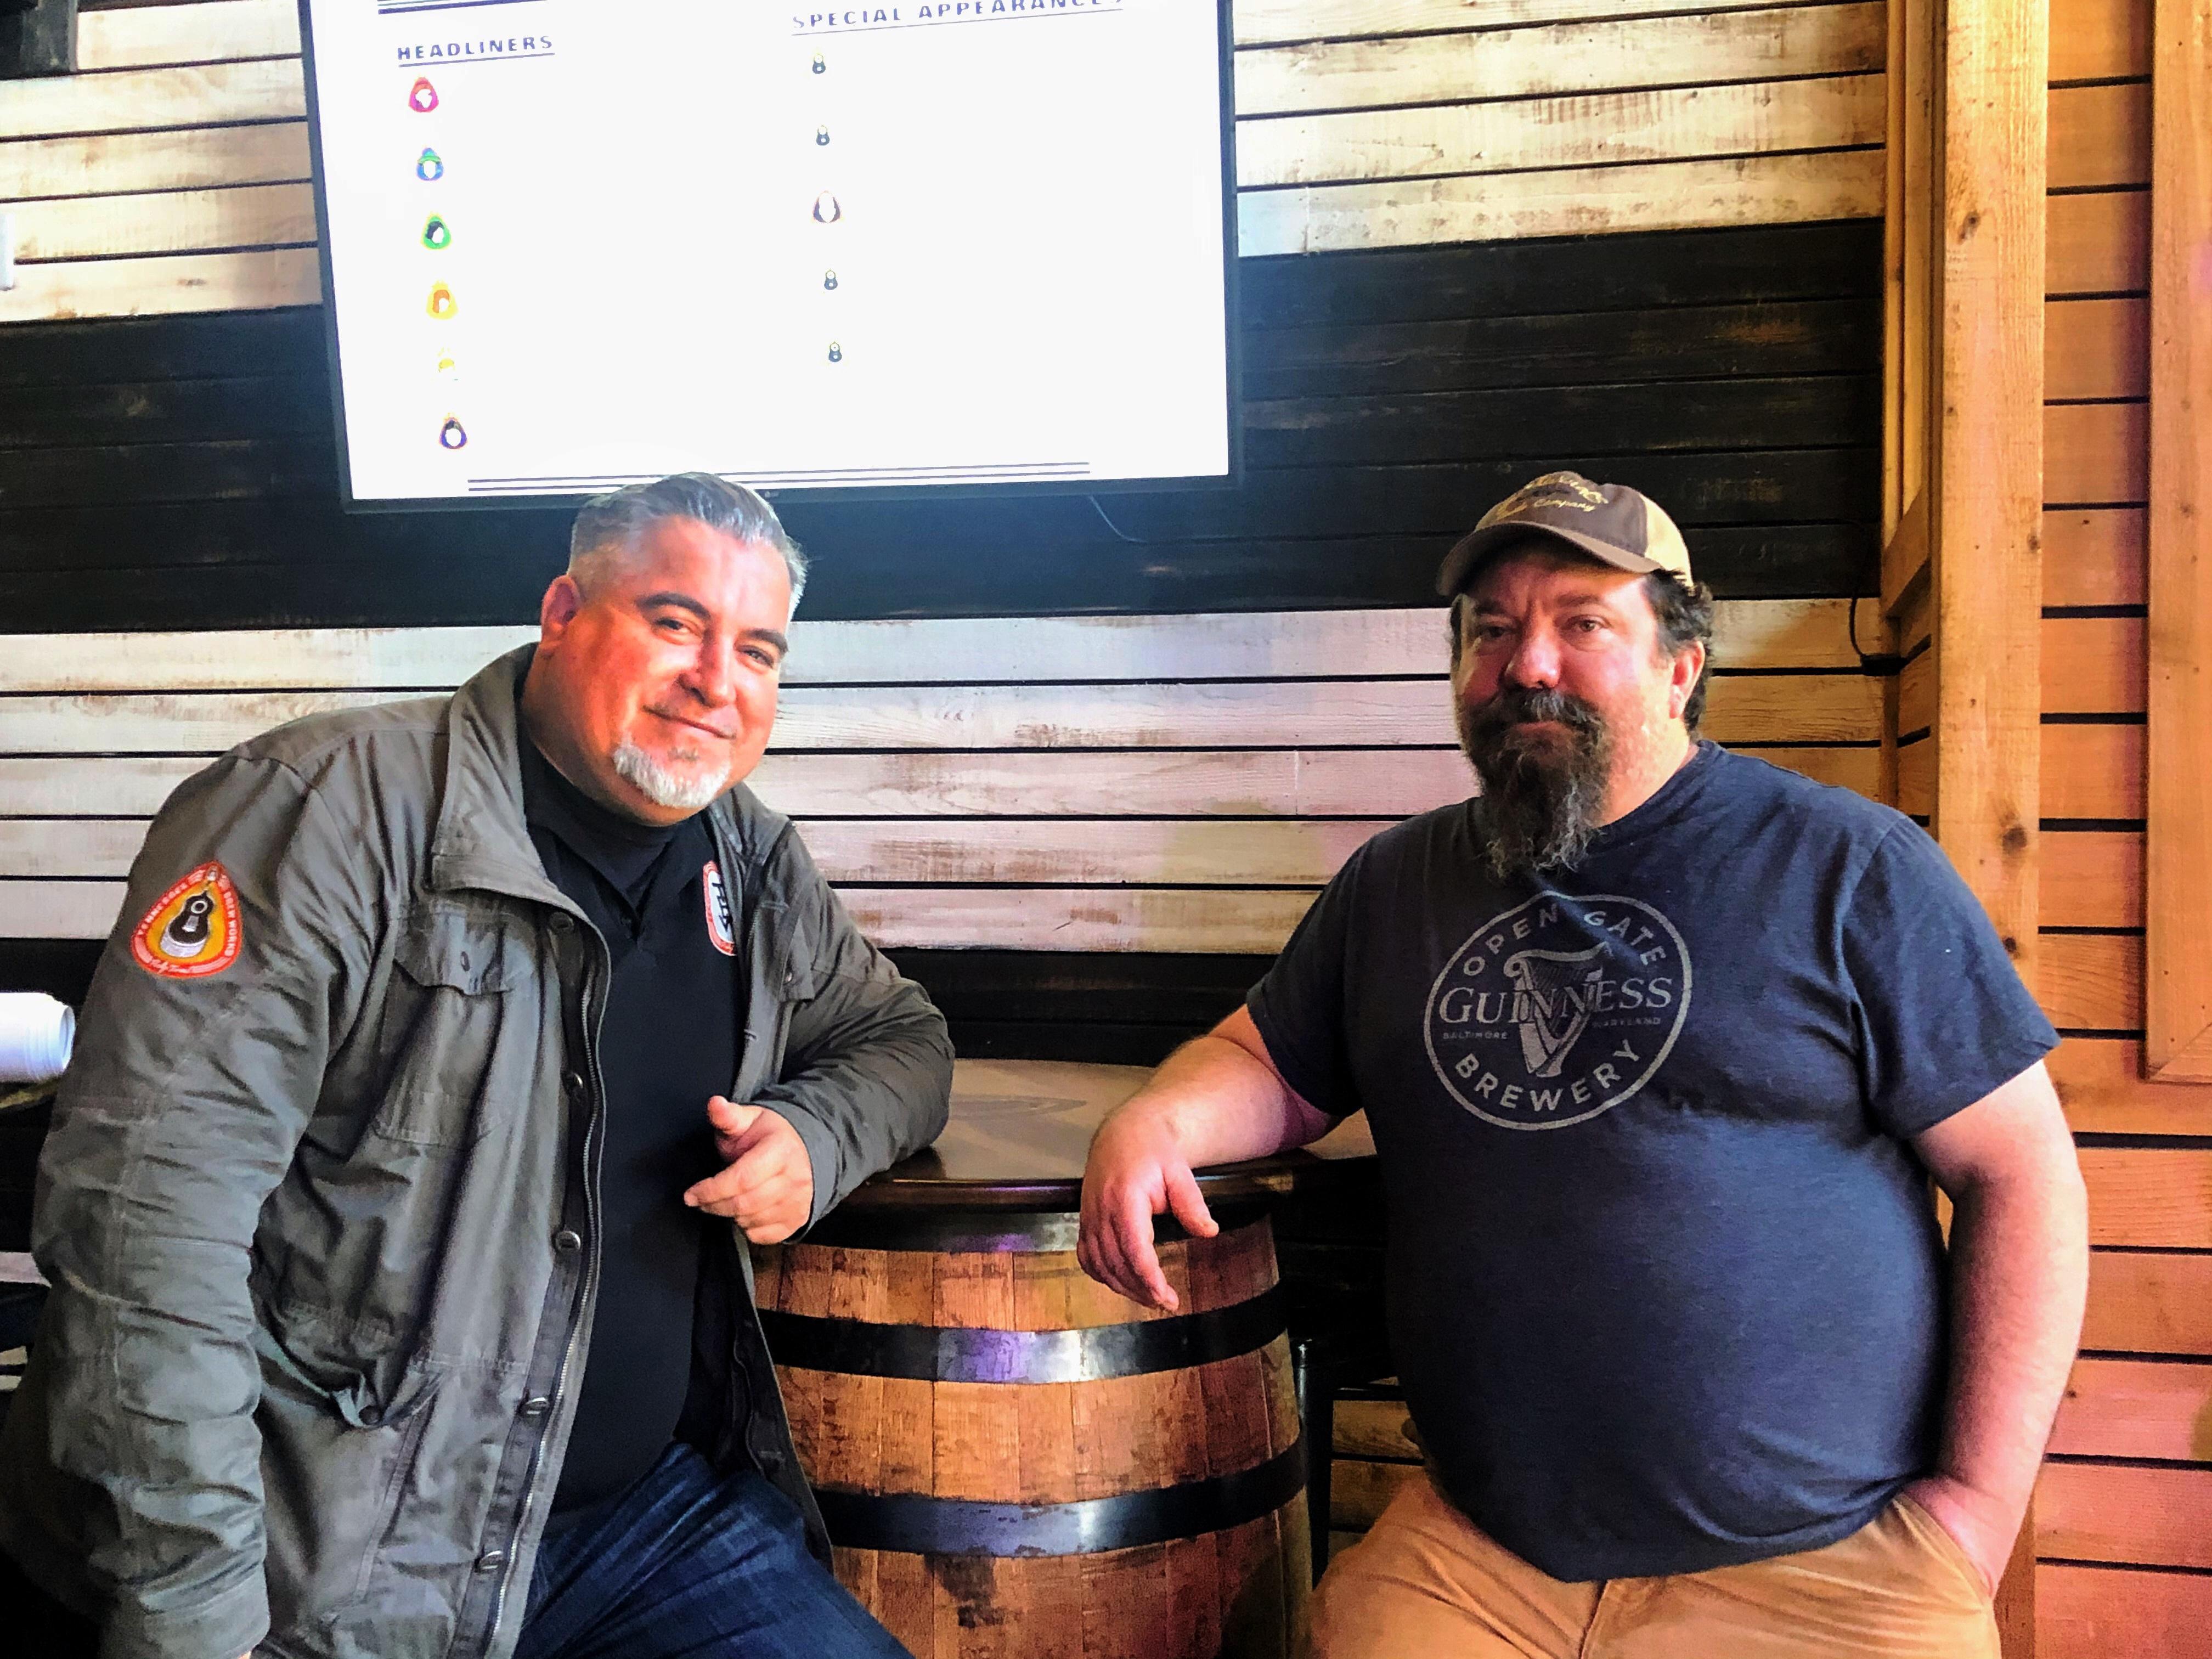 Tennessee Brew Works Christian Spears (left) & Matt Simpson (right)